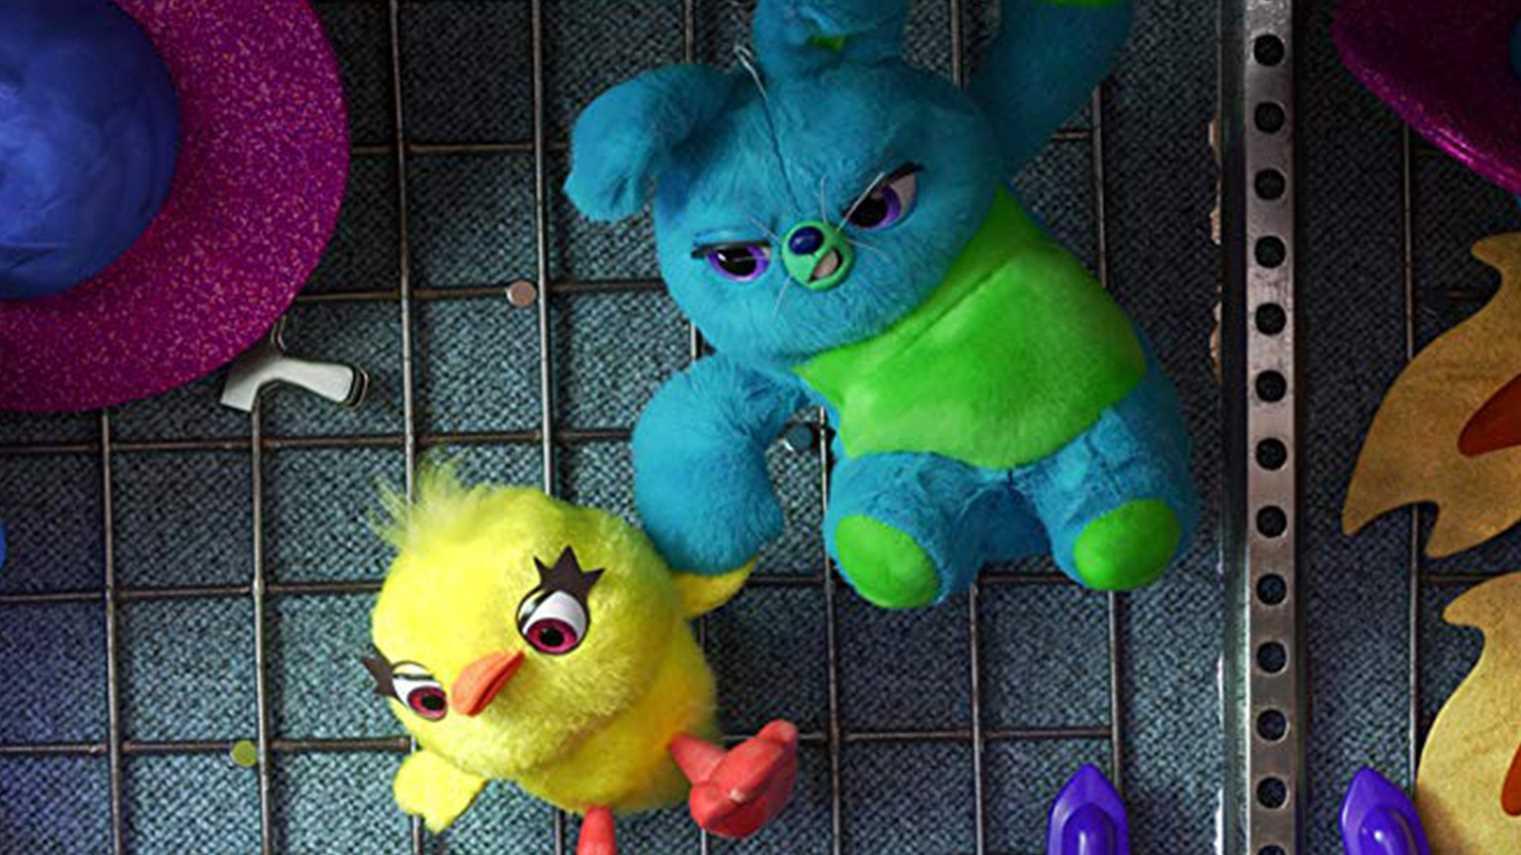 Watch Toy Story 4 at Vue Cinema | Book Tickets Online